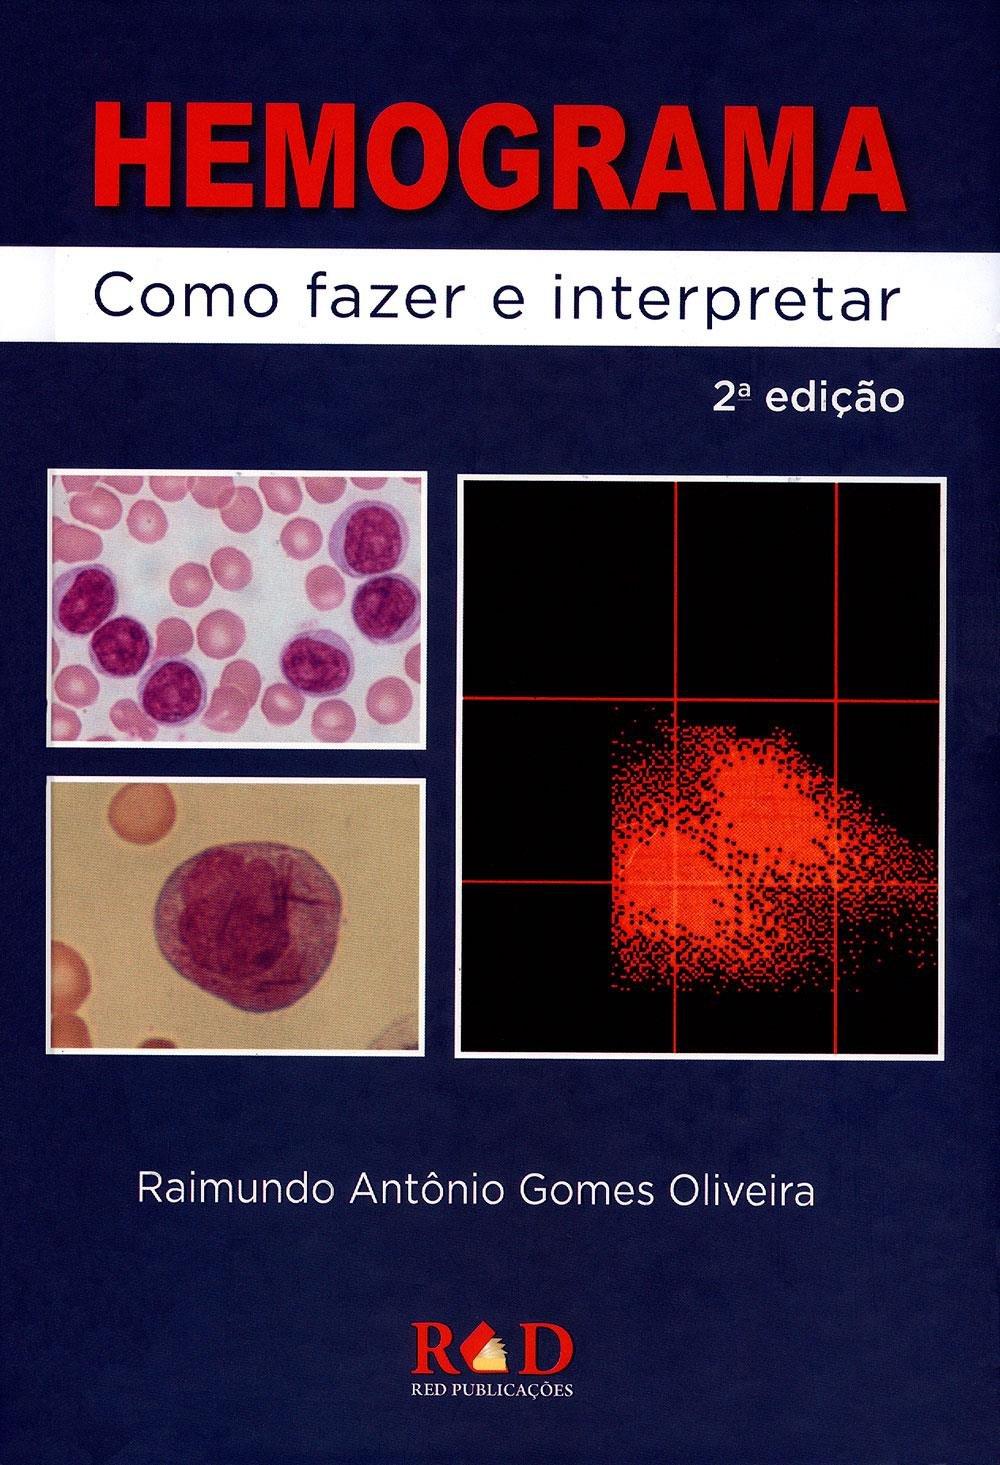 Curso de hemograma online gratis